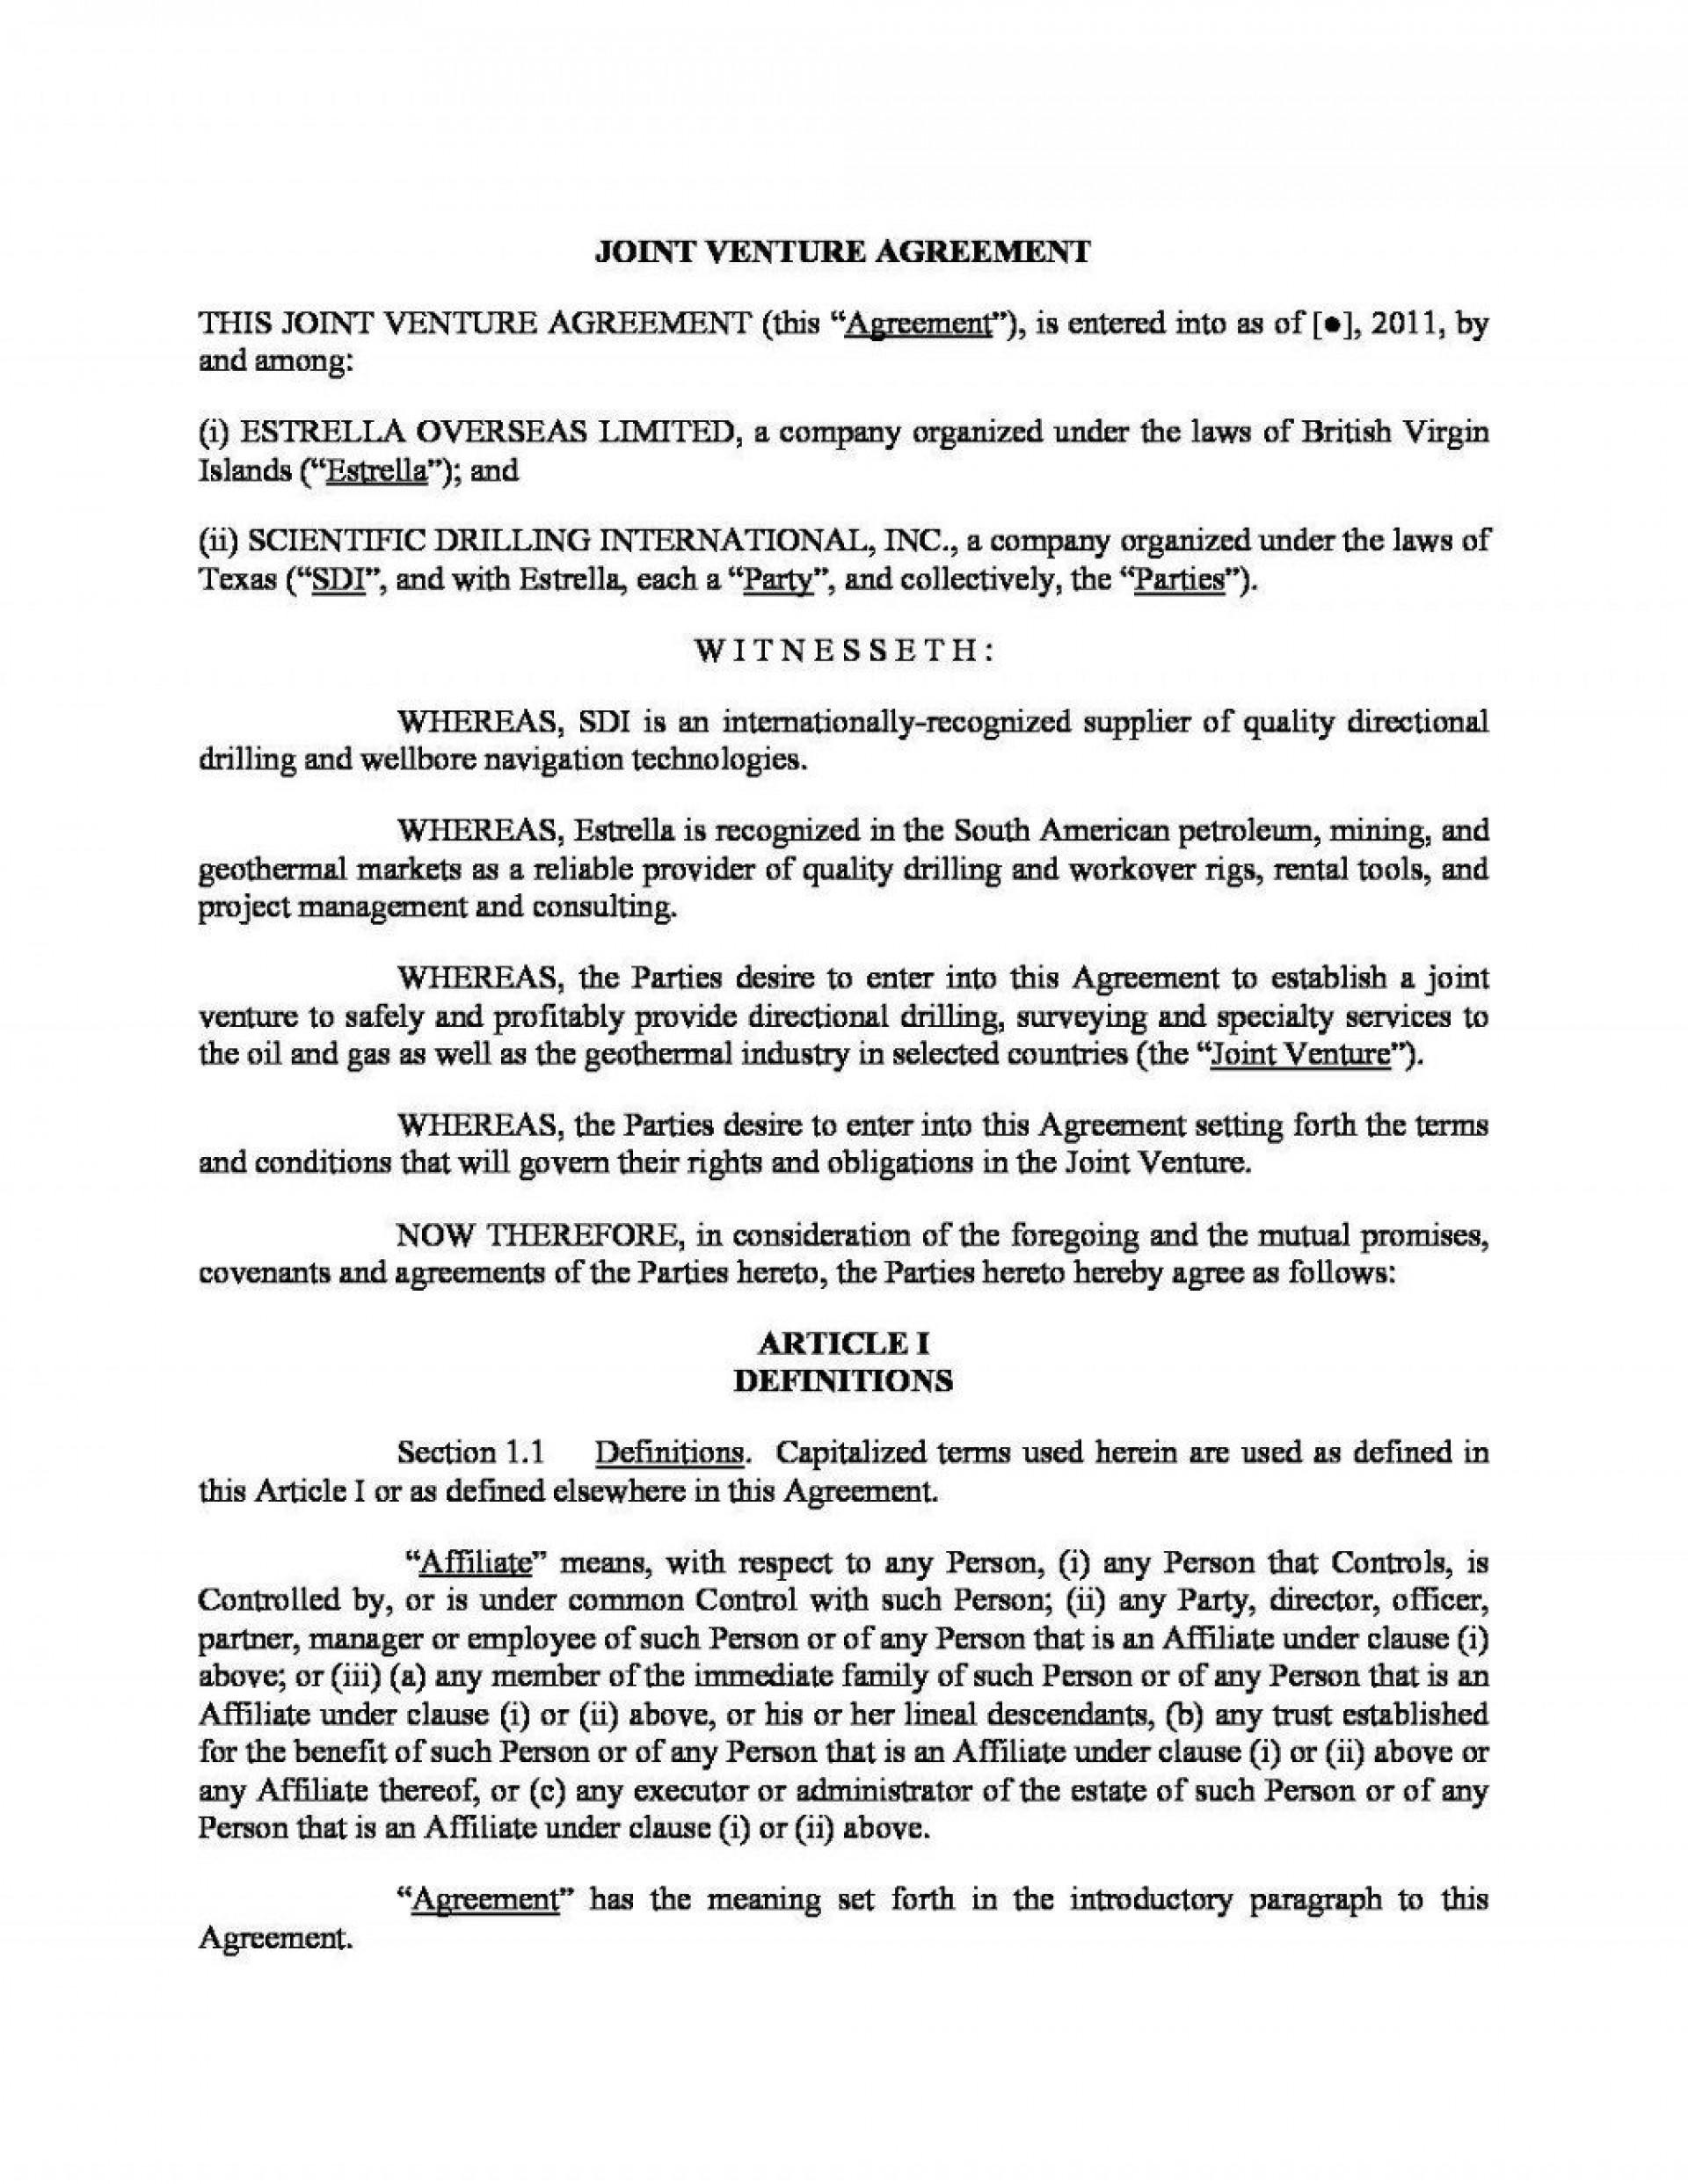 003 Wonderful Property Development Joint Venture Agreement Template Uk Highest Quality 1920